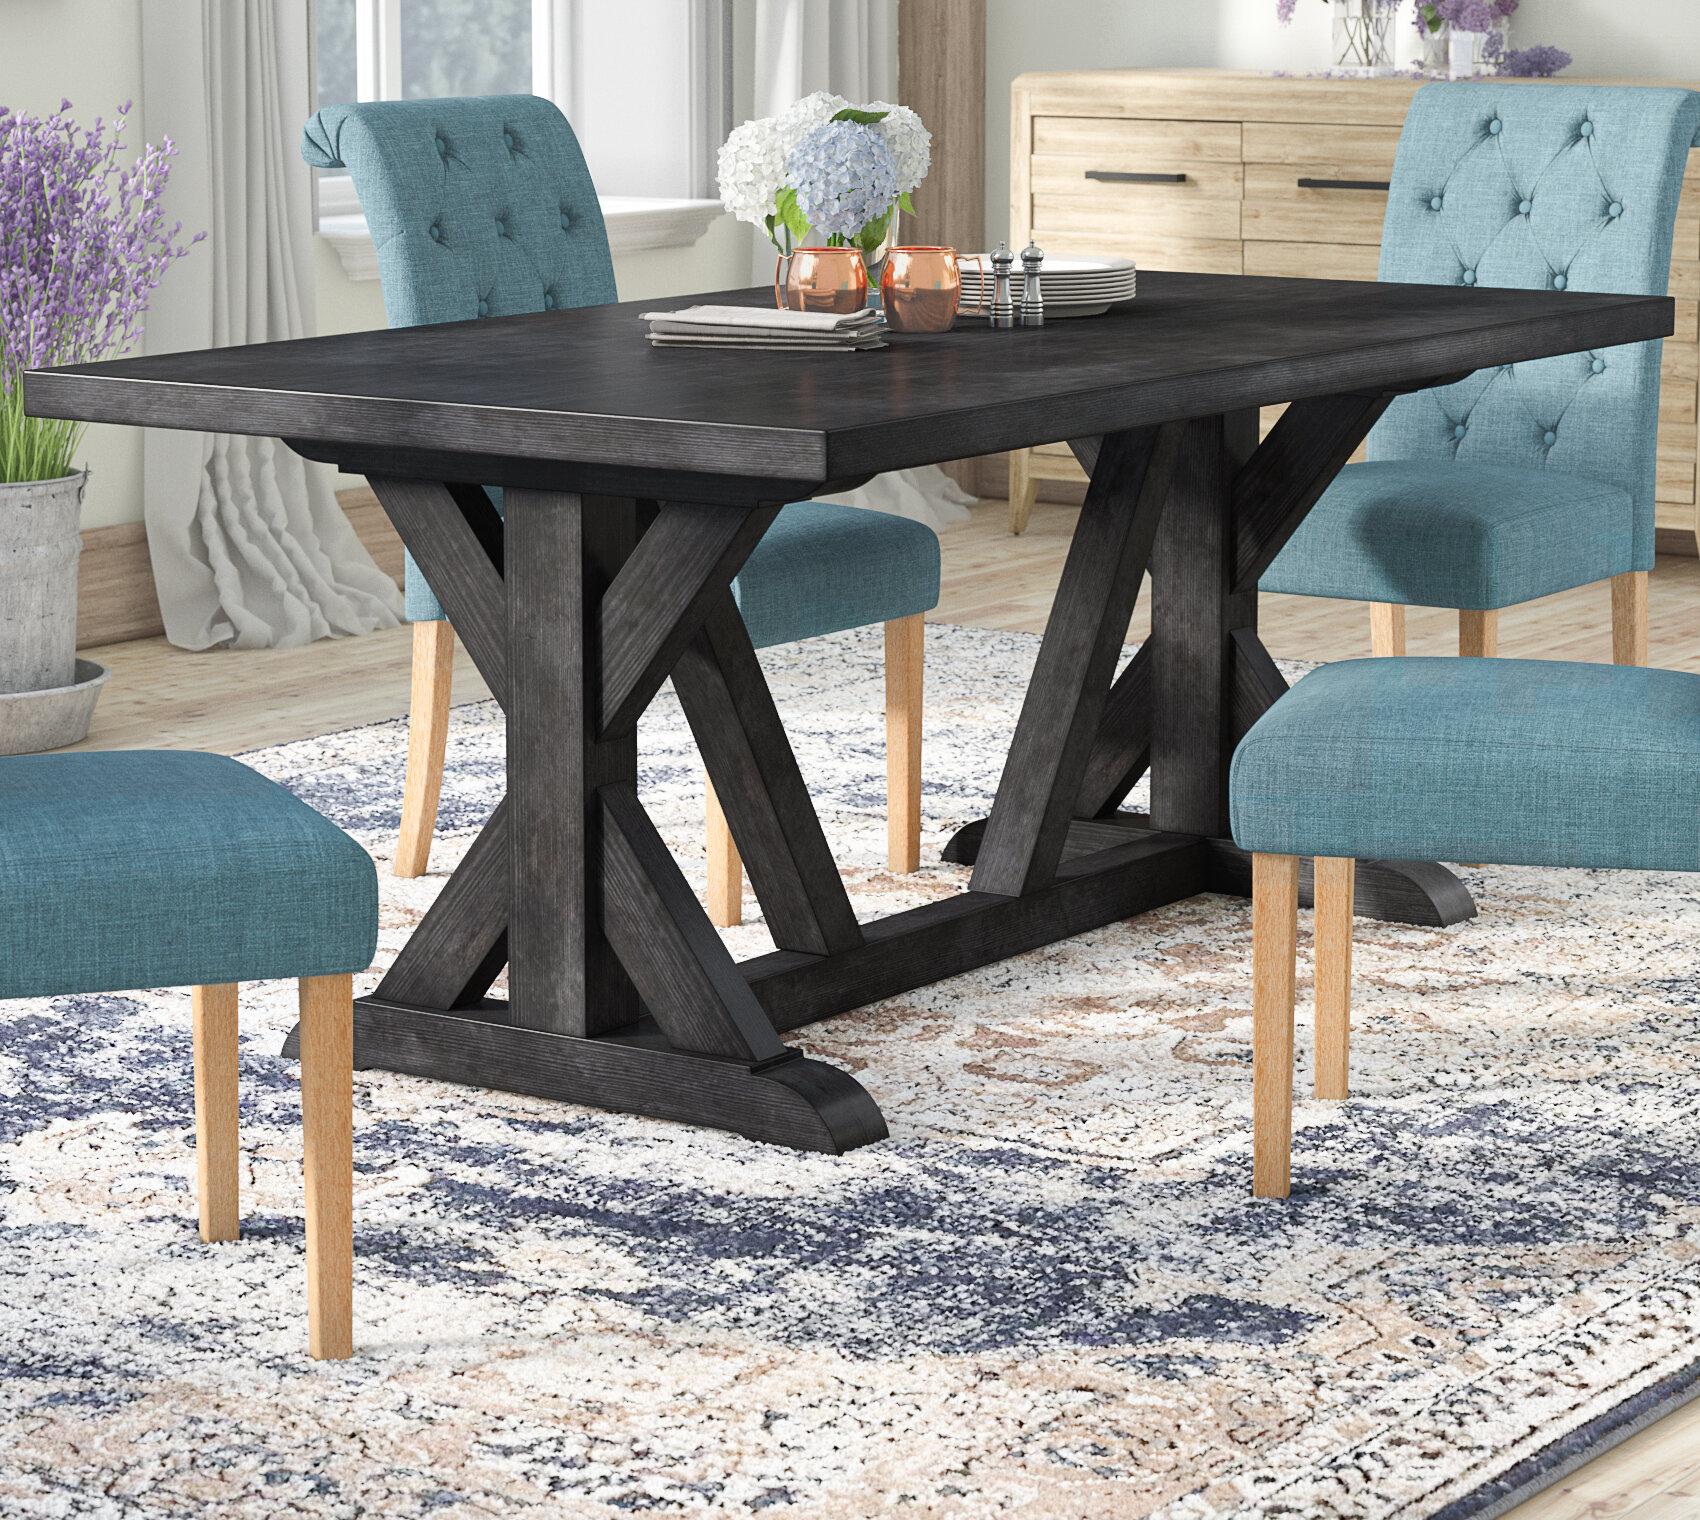 Laurel Foundry Modern Farmhouse Sydney Solid Wood Dining Table Reviews Wayfair